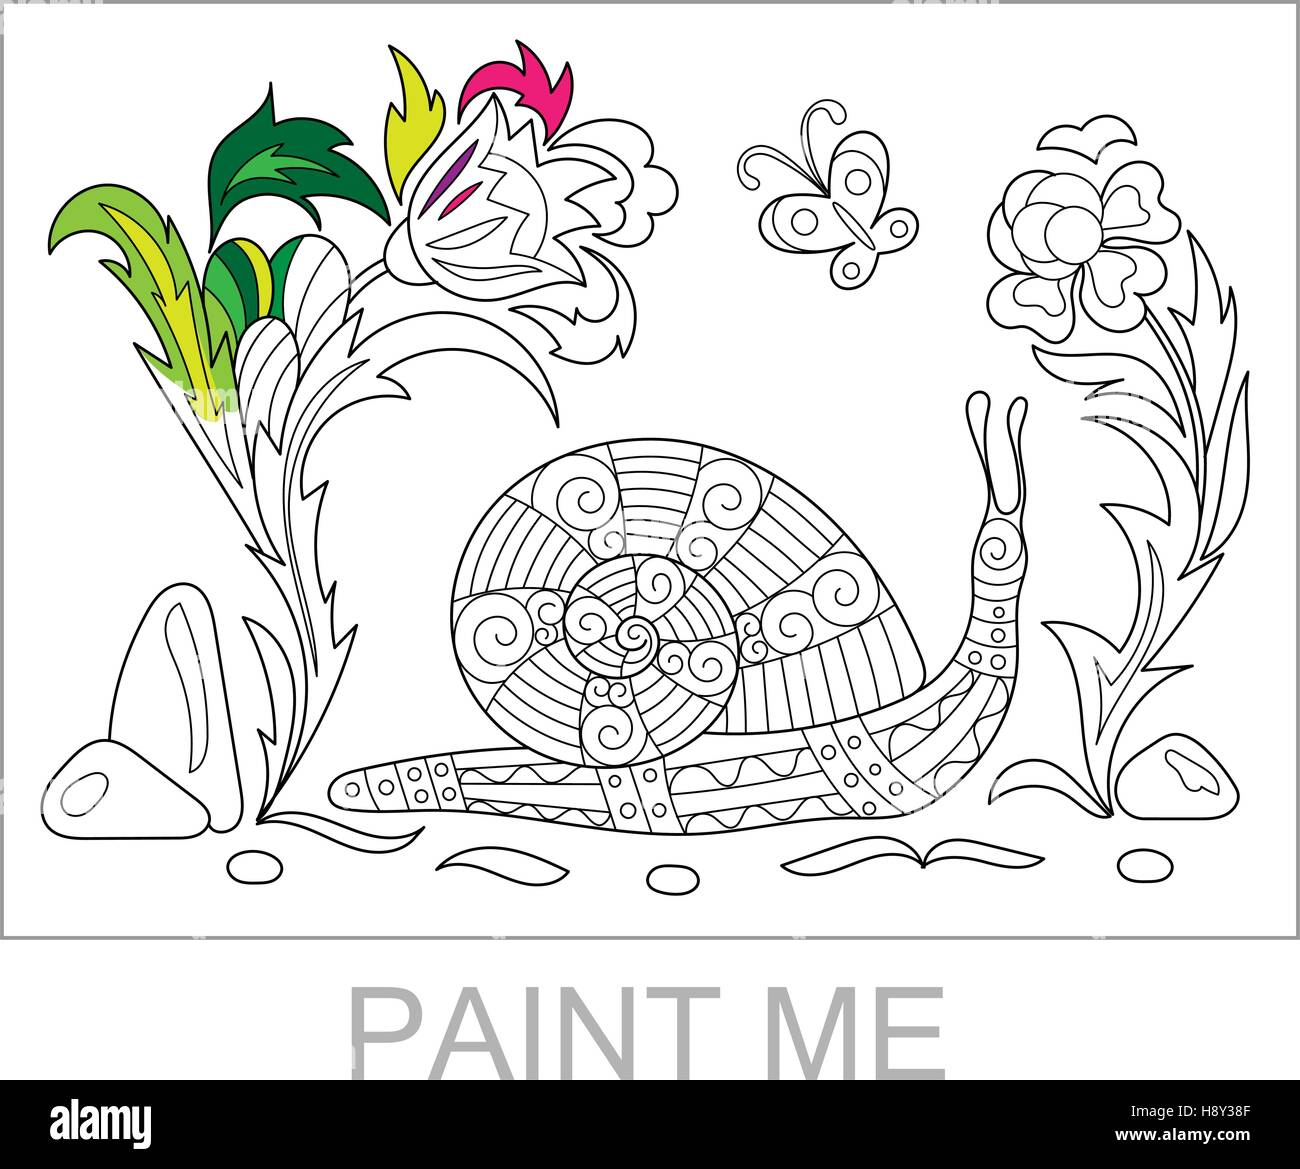 Zentangle Caricatura Estilizados Caracol Rastreo Entre Las Flores